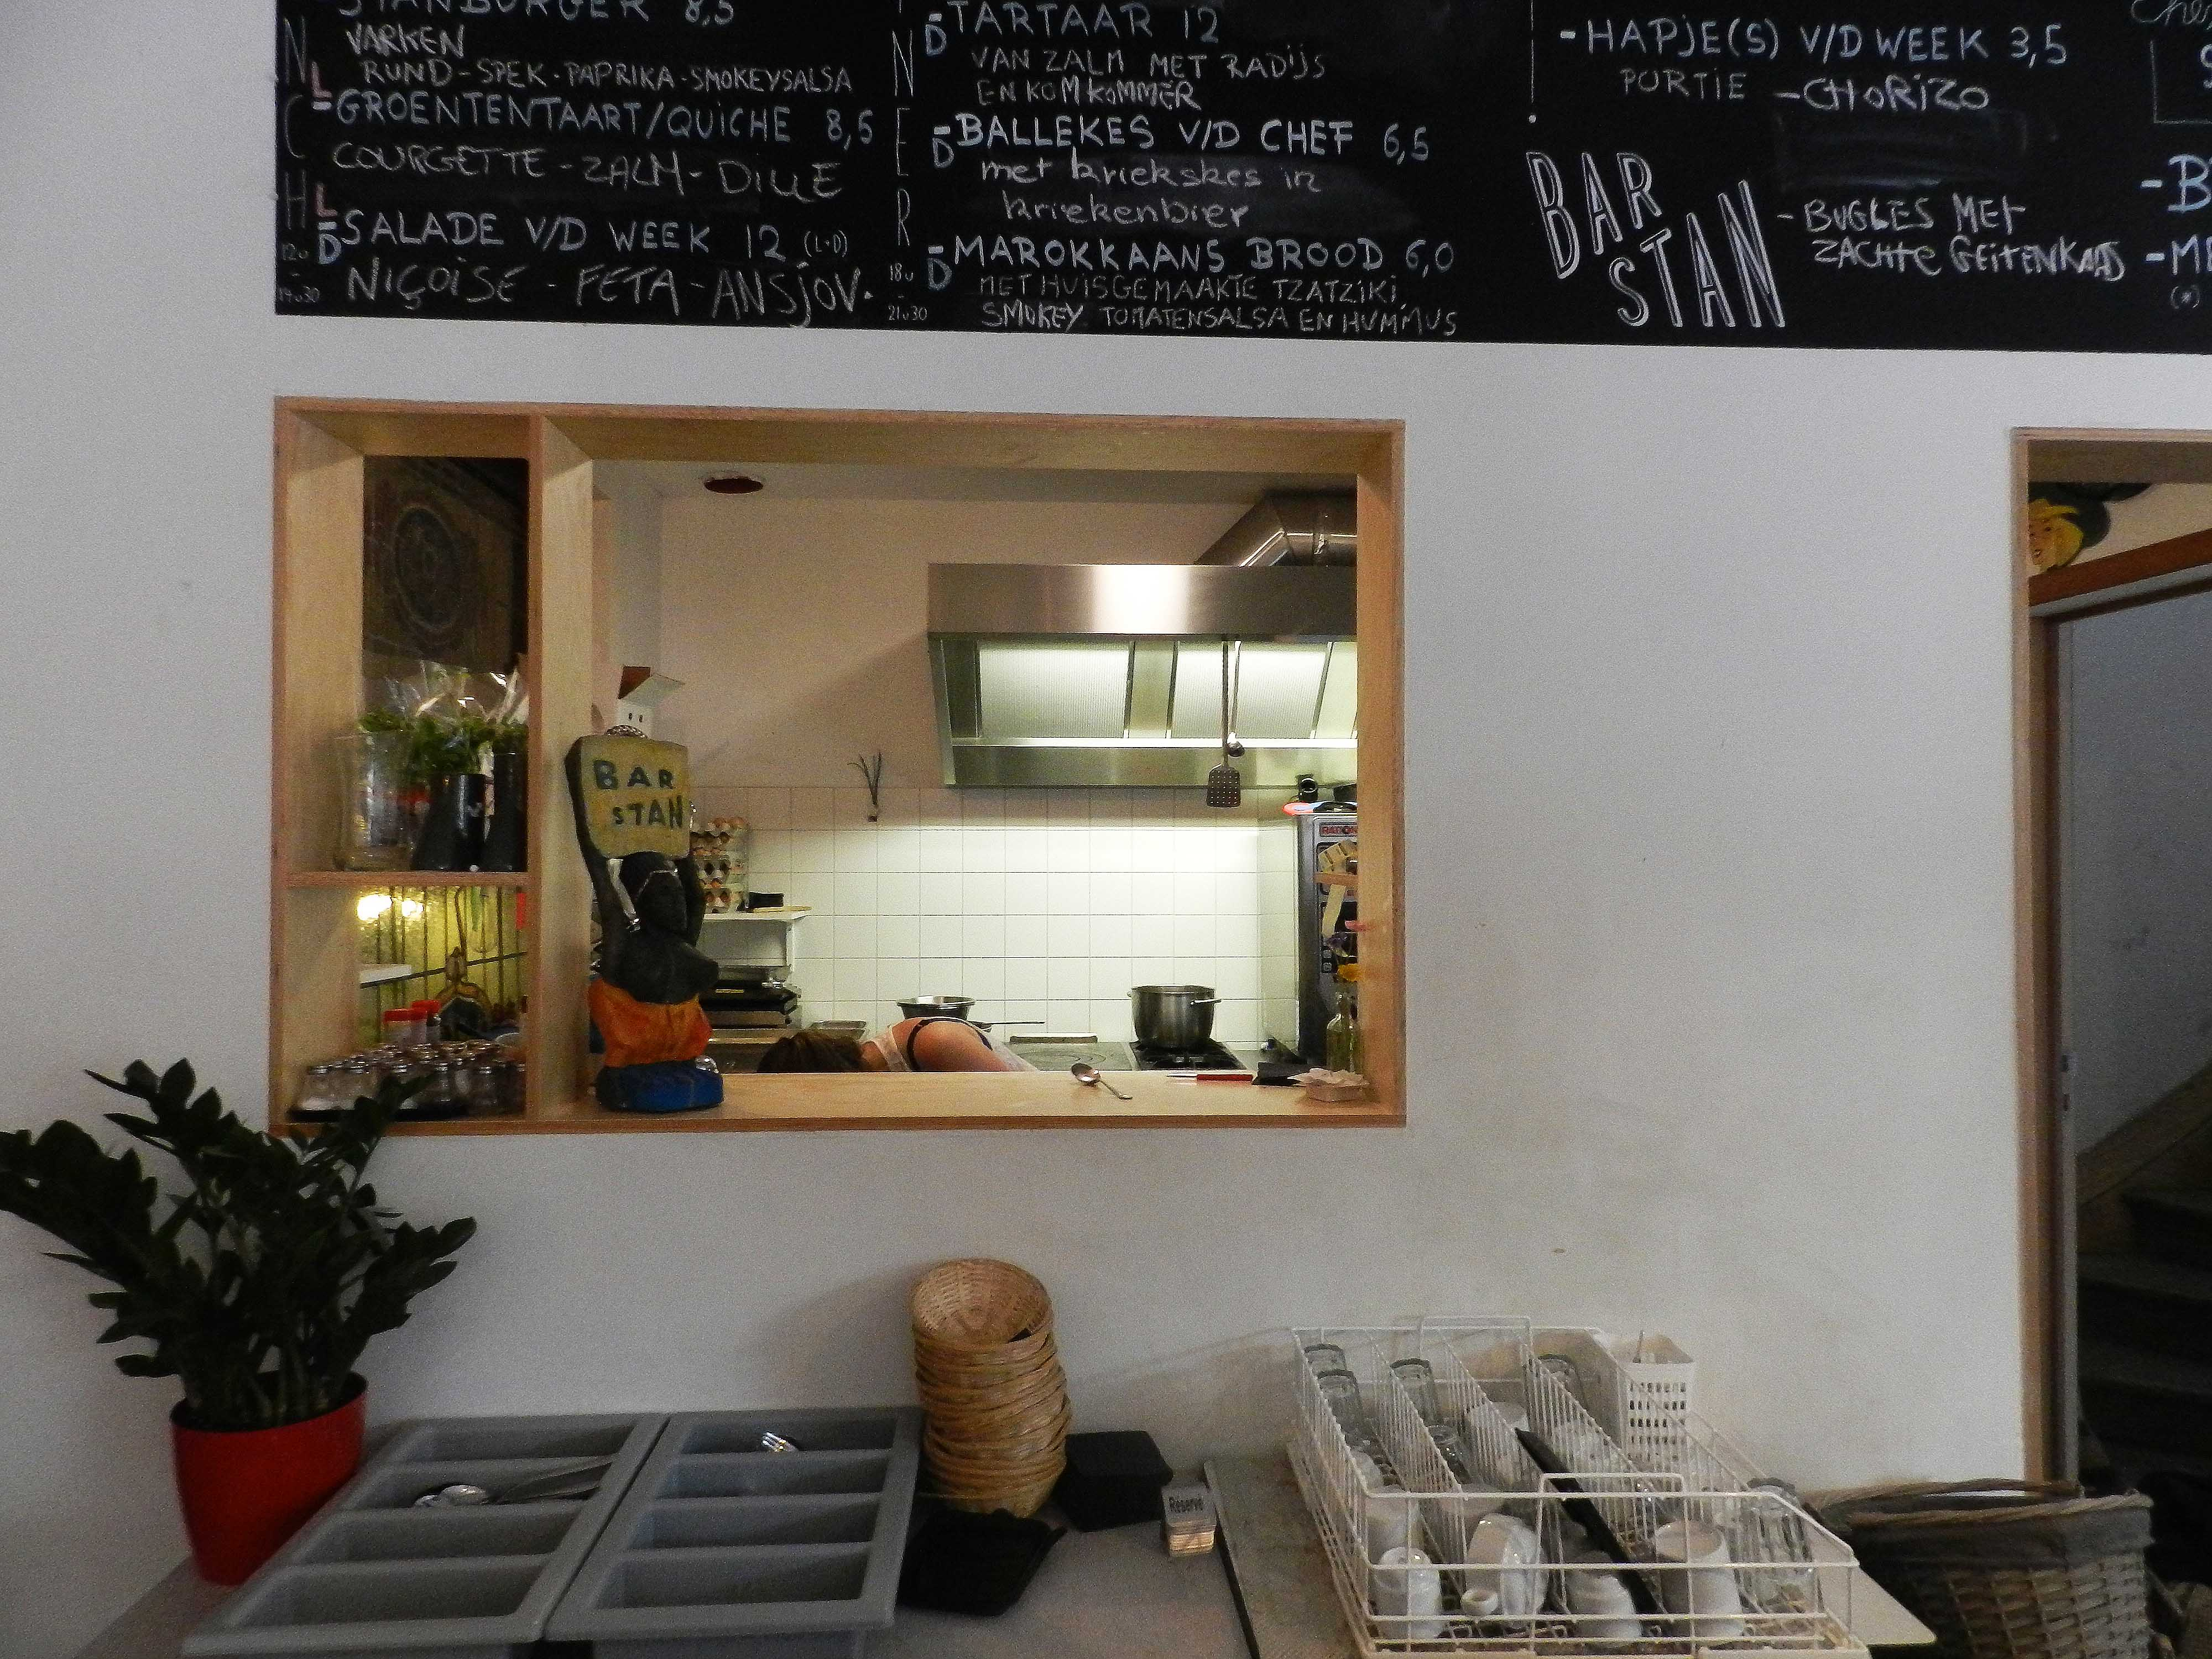 Elle summer tour onze favoriete eetplekjes in leuven for Interieur winkel leuven